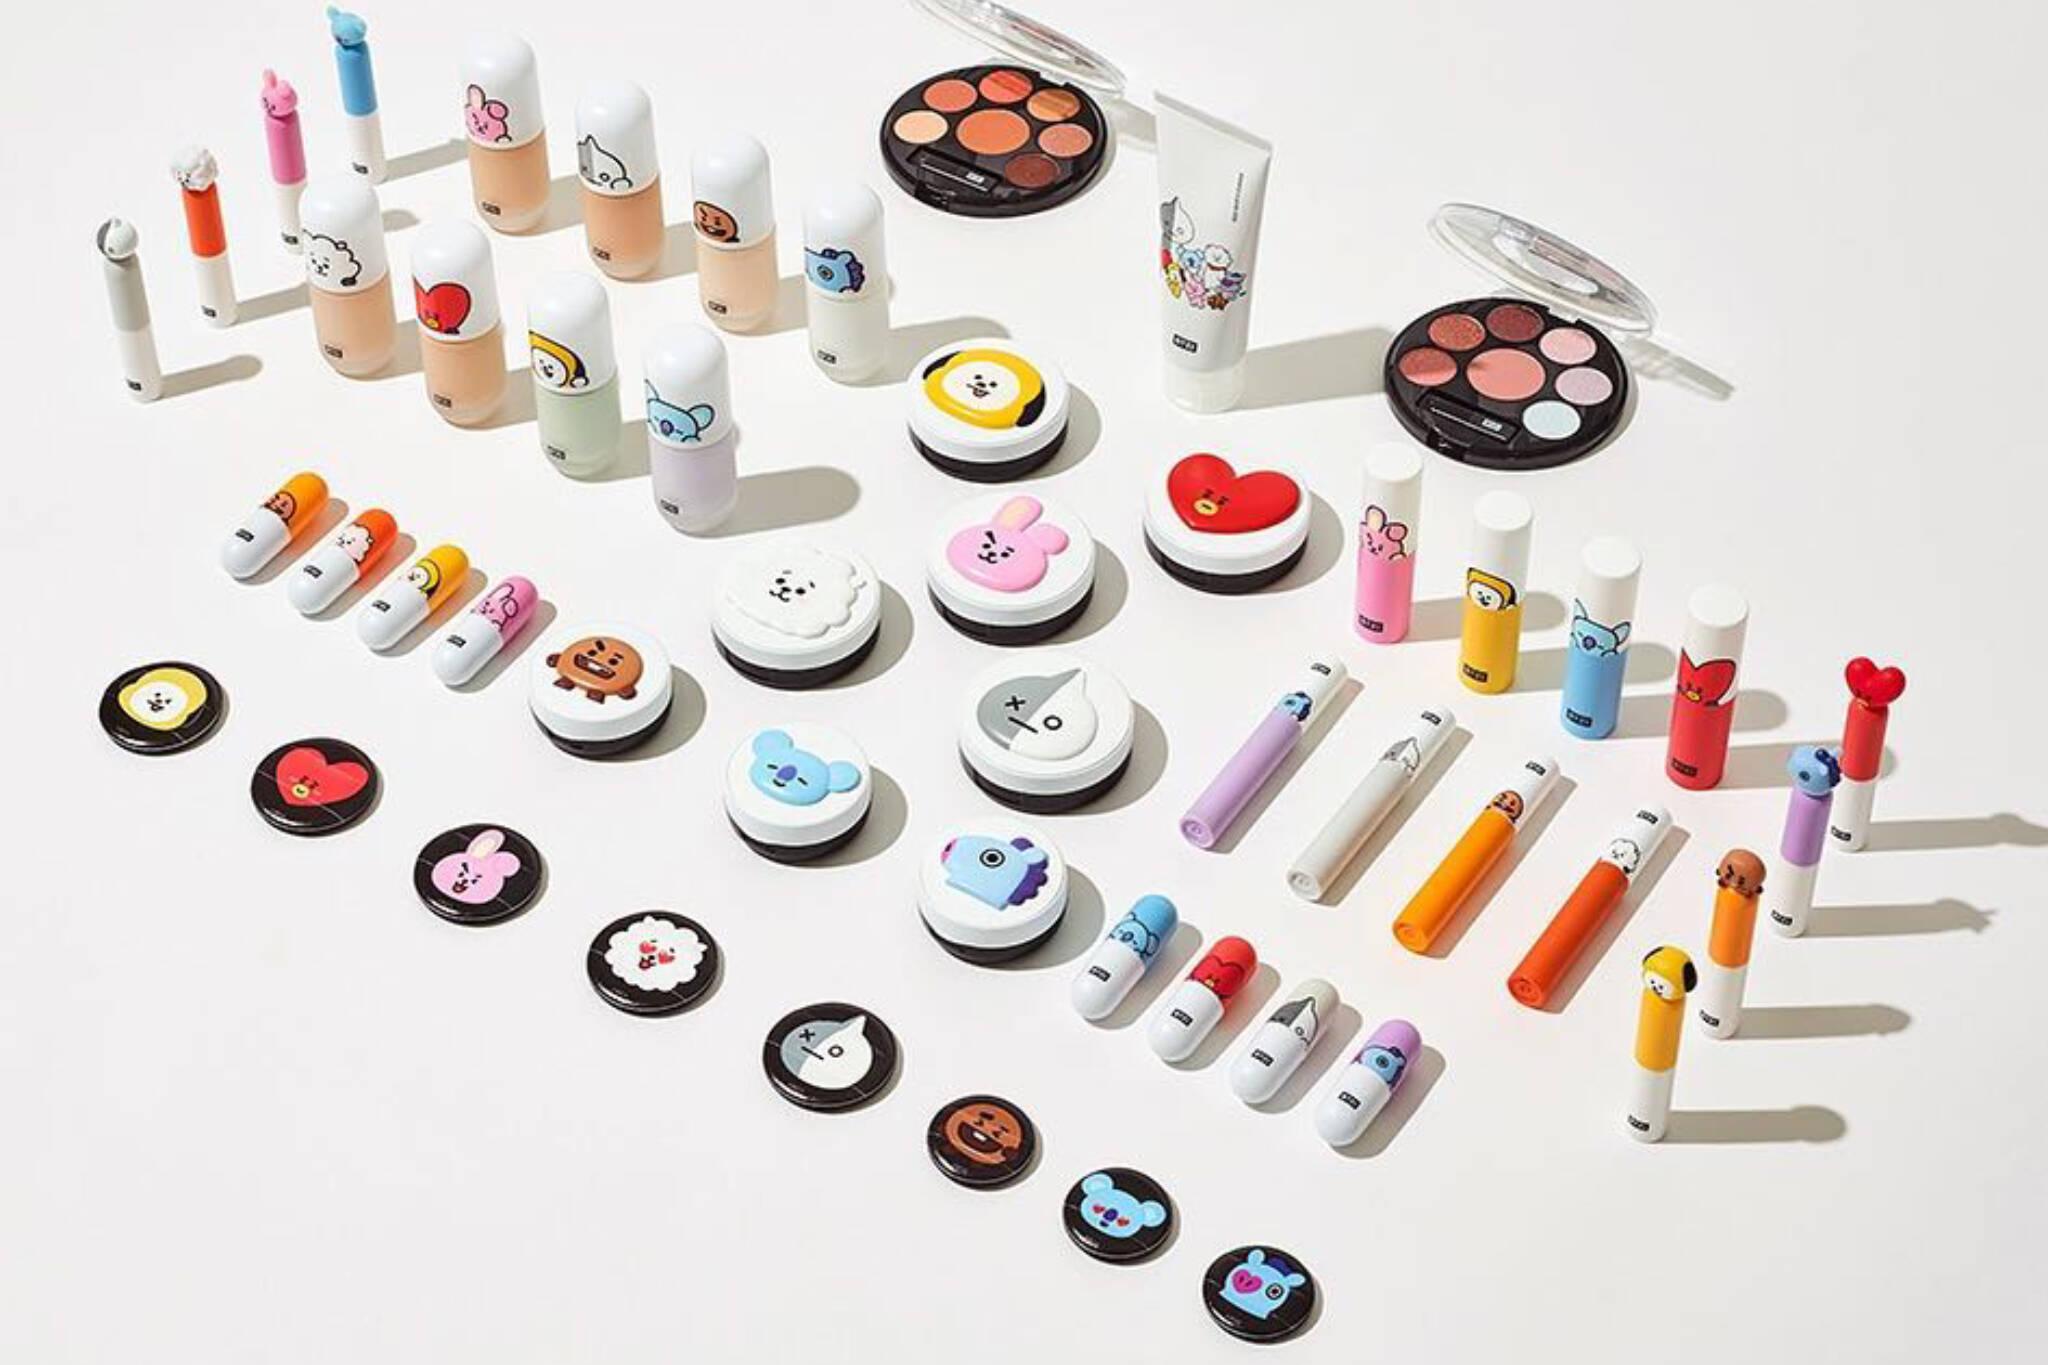 bts cosmetics toronto